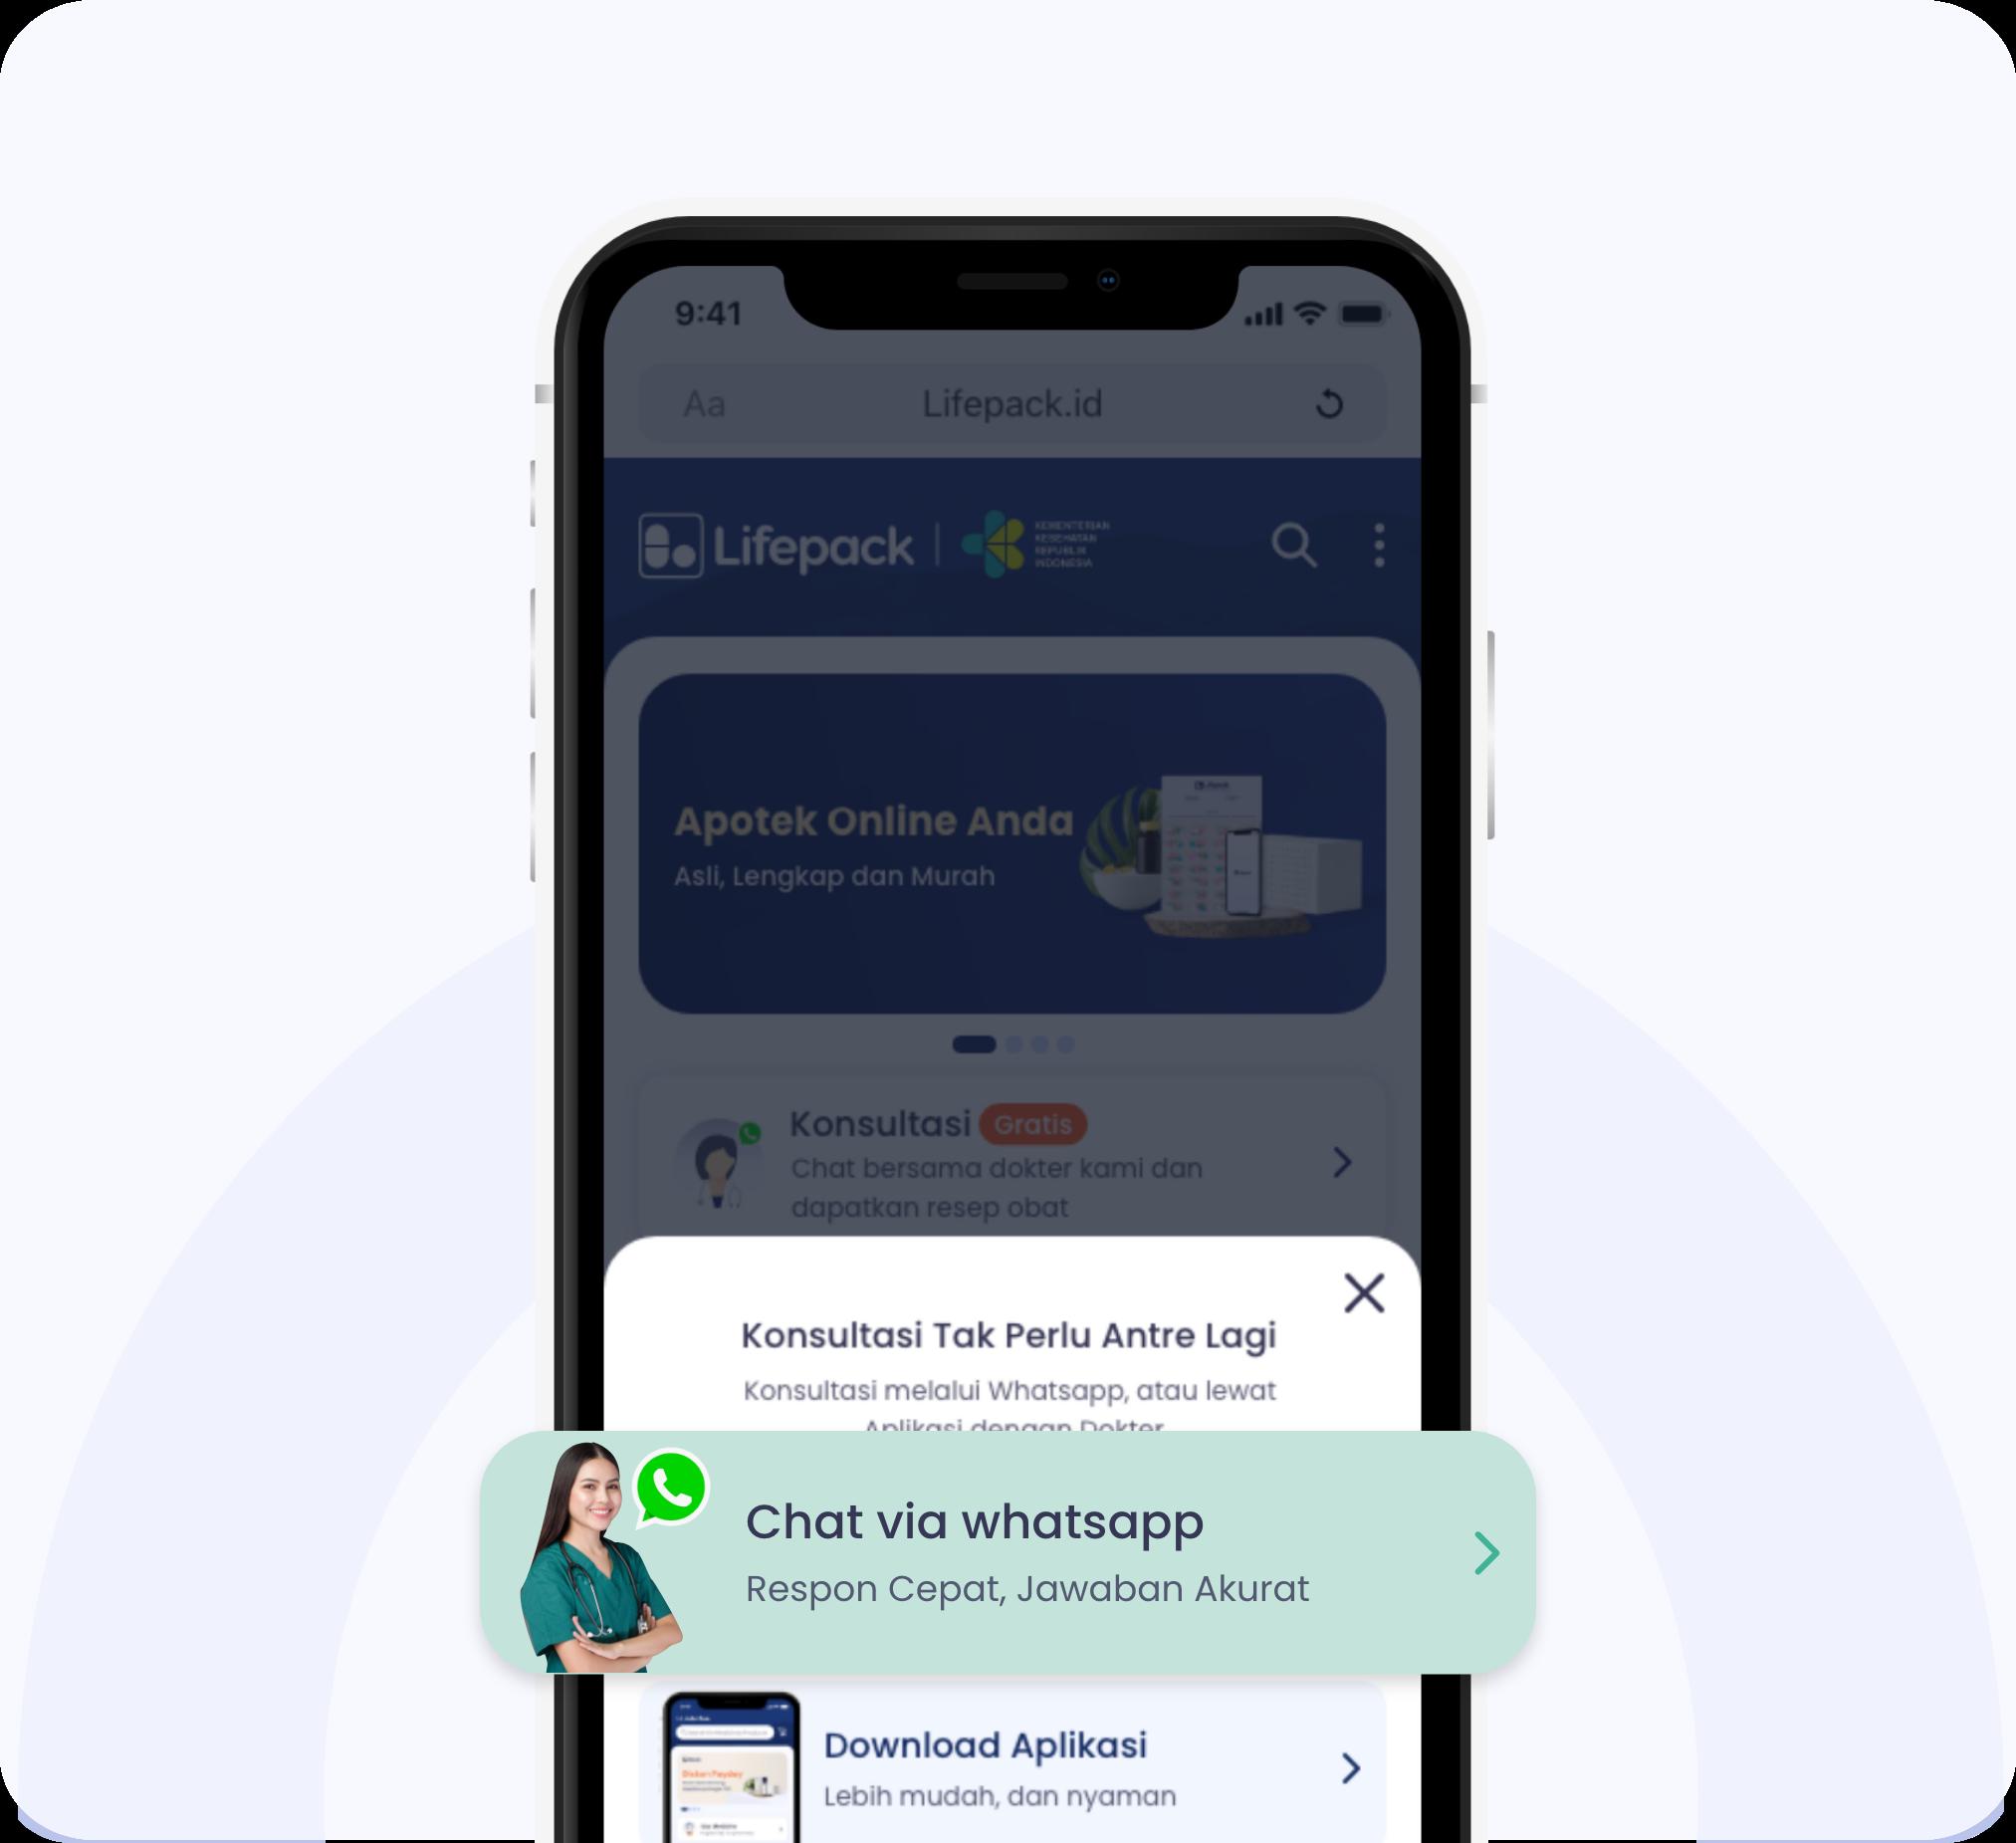 Tata Cara Tebus Obat Via Whatsapp Step 2